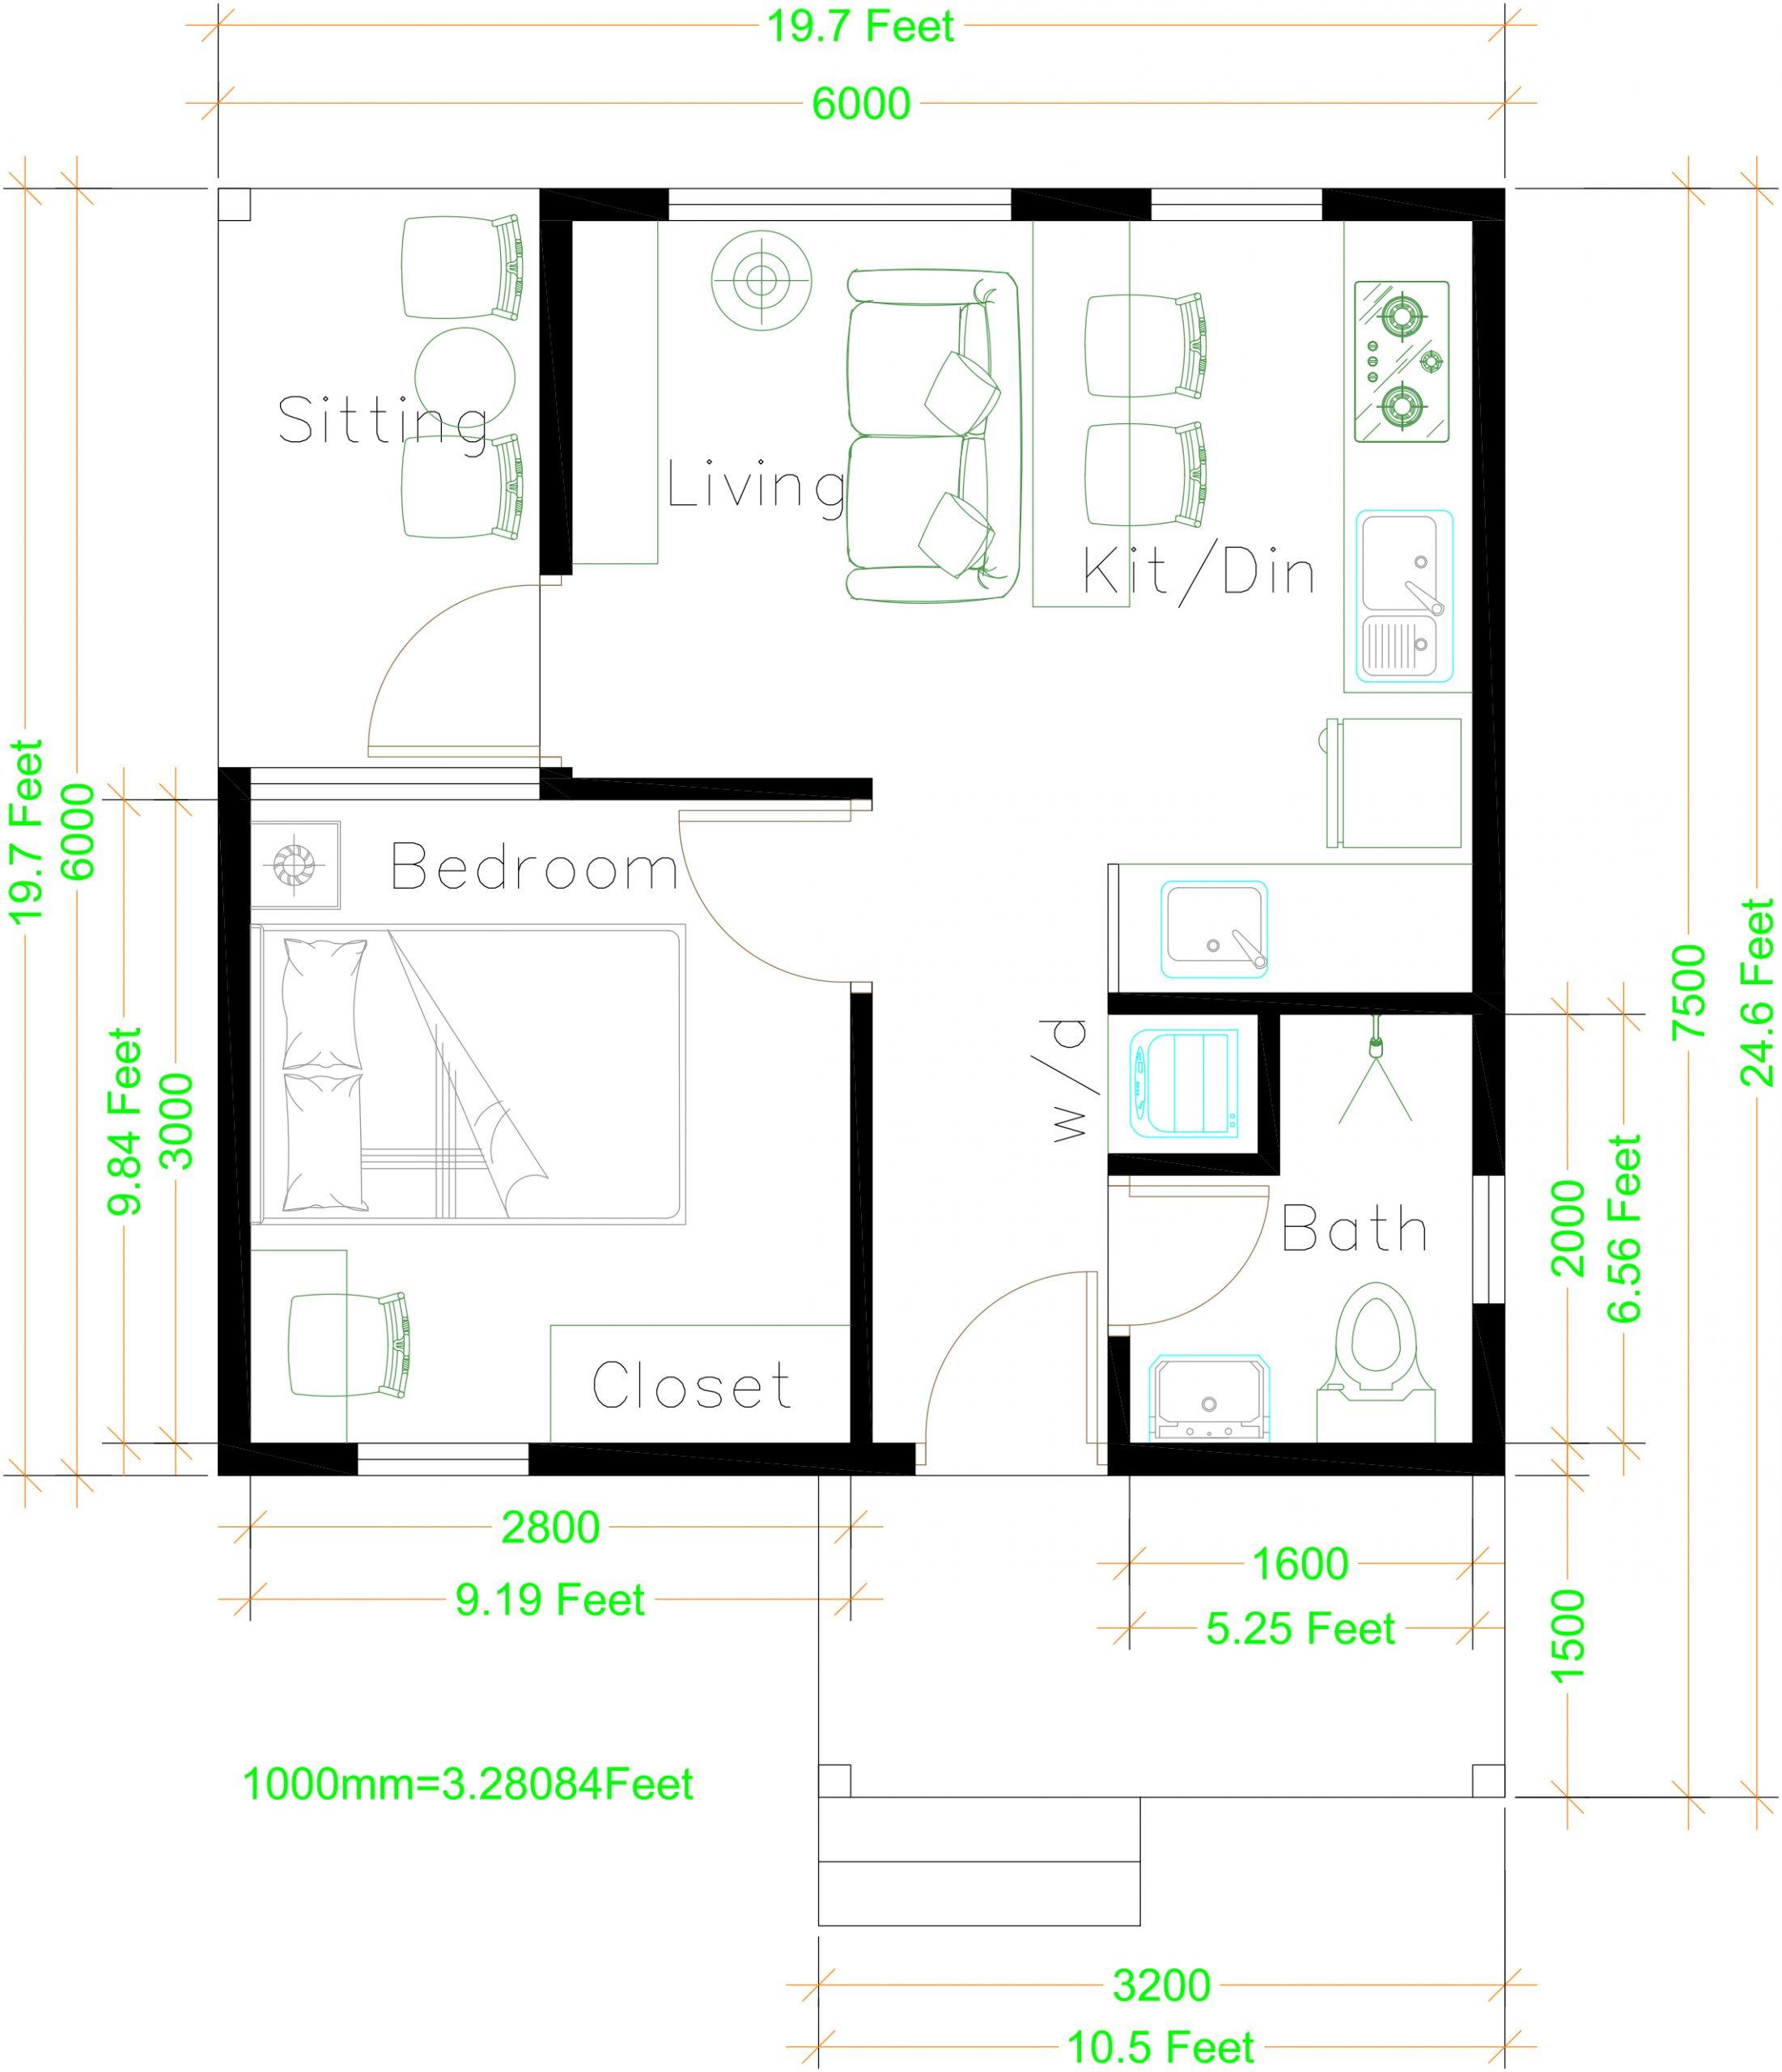 6x7.5 house floorplan